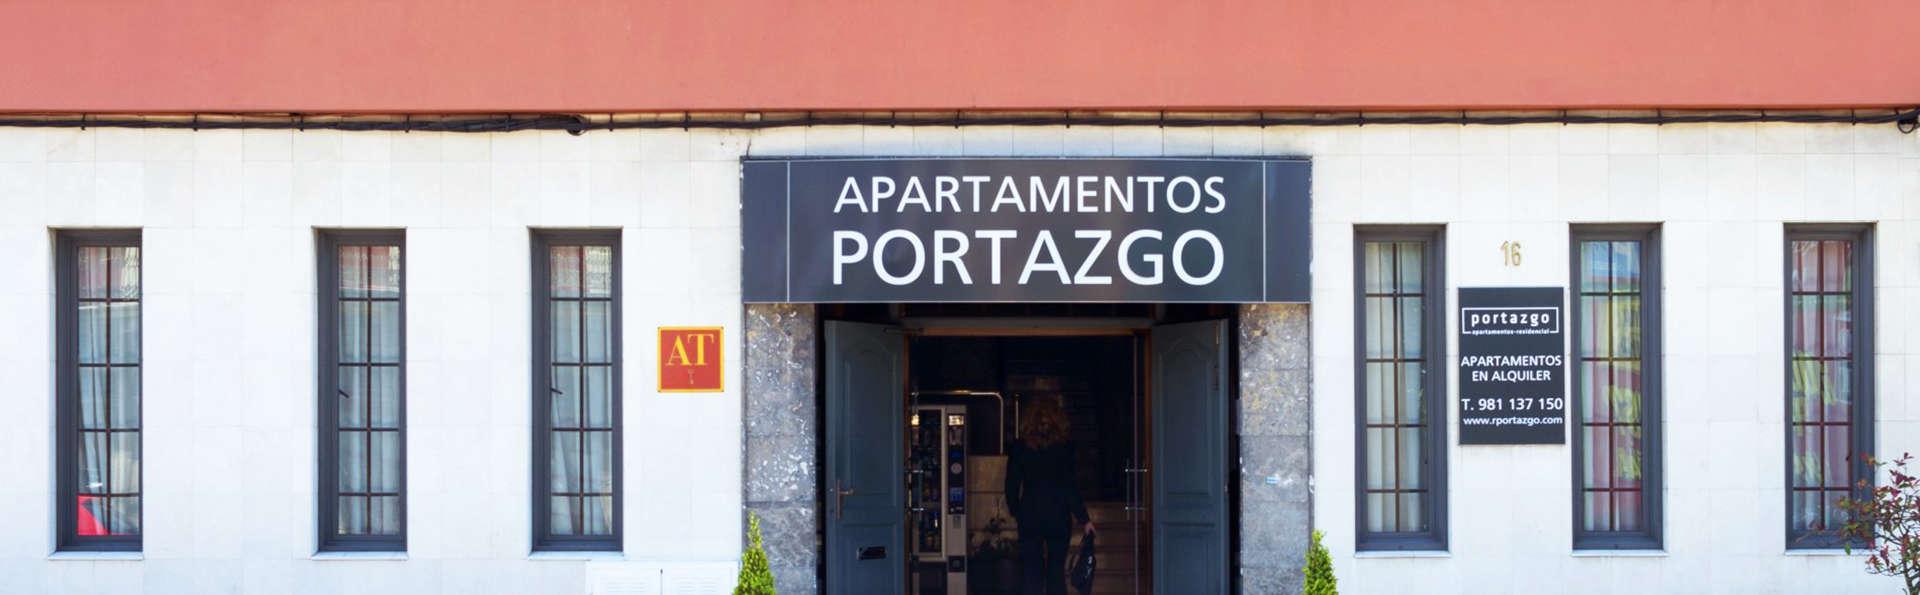 Apartamentos Attica 21 Portazgo - EDIT_Exterior1.jpg